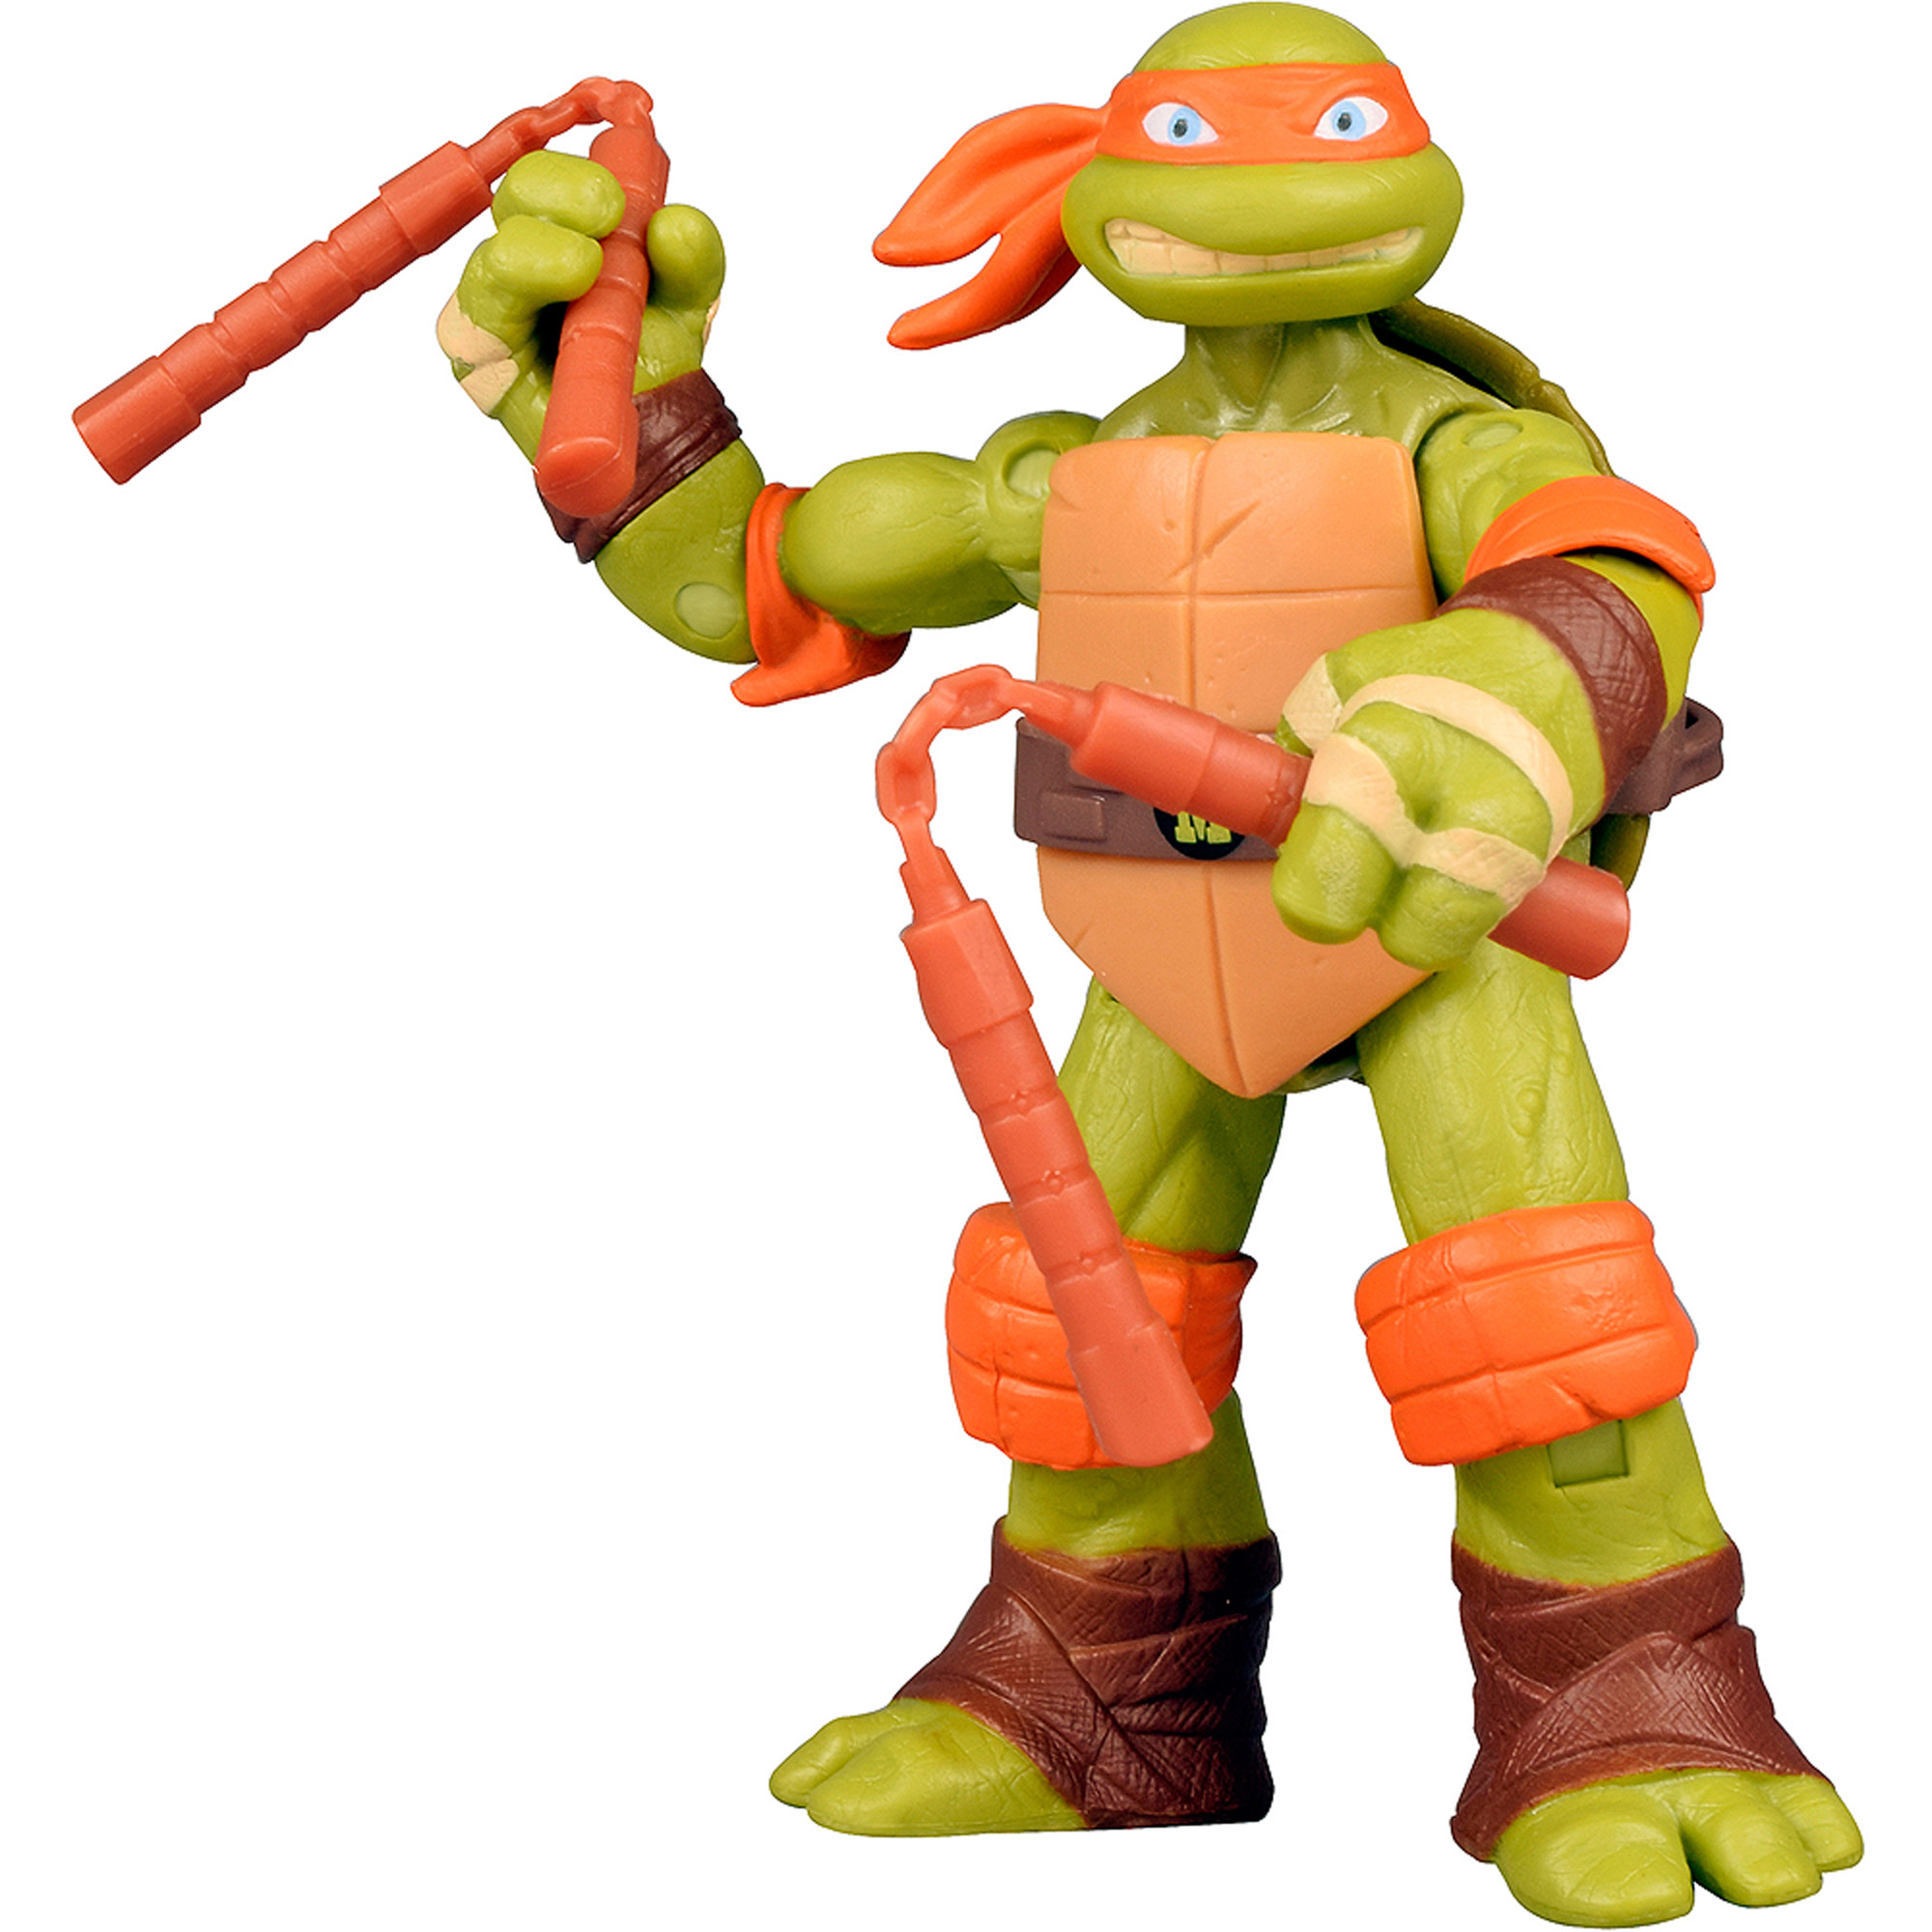 Nickelodeon Teenage Mutant Ninja Turtles Re-Deco Action Figure, Michelangelo